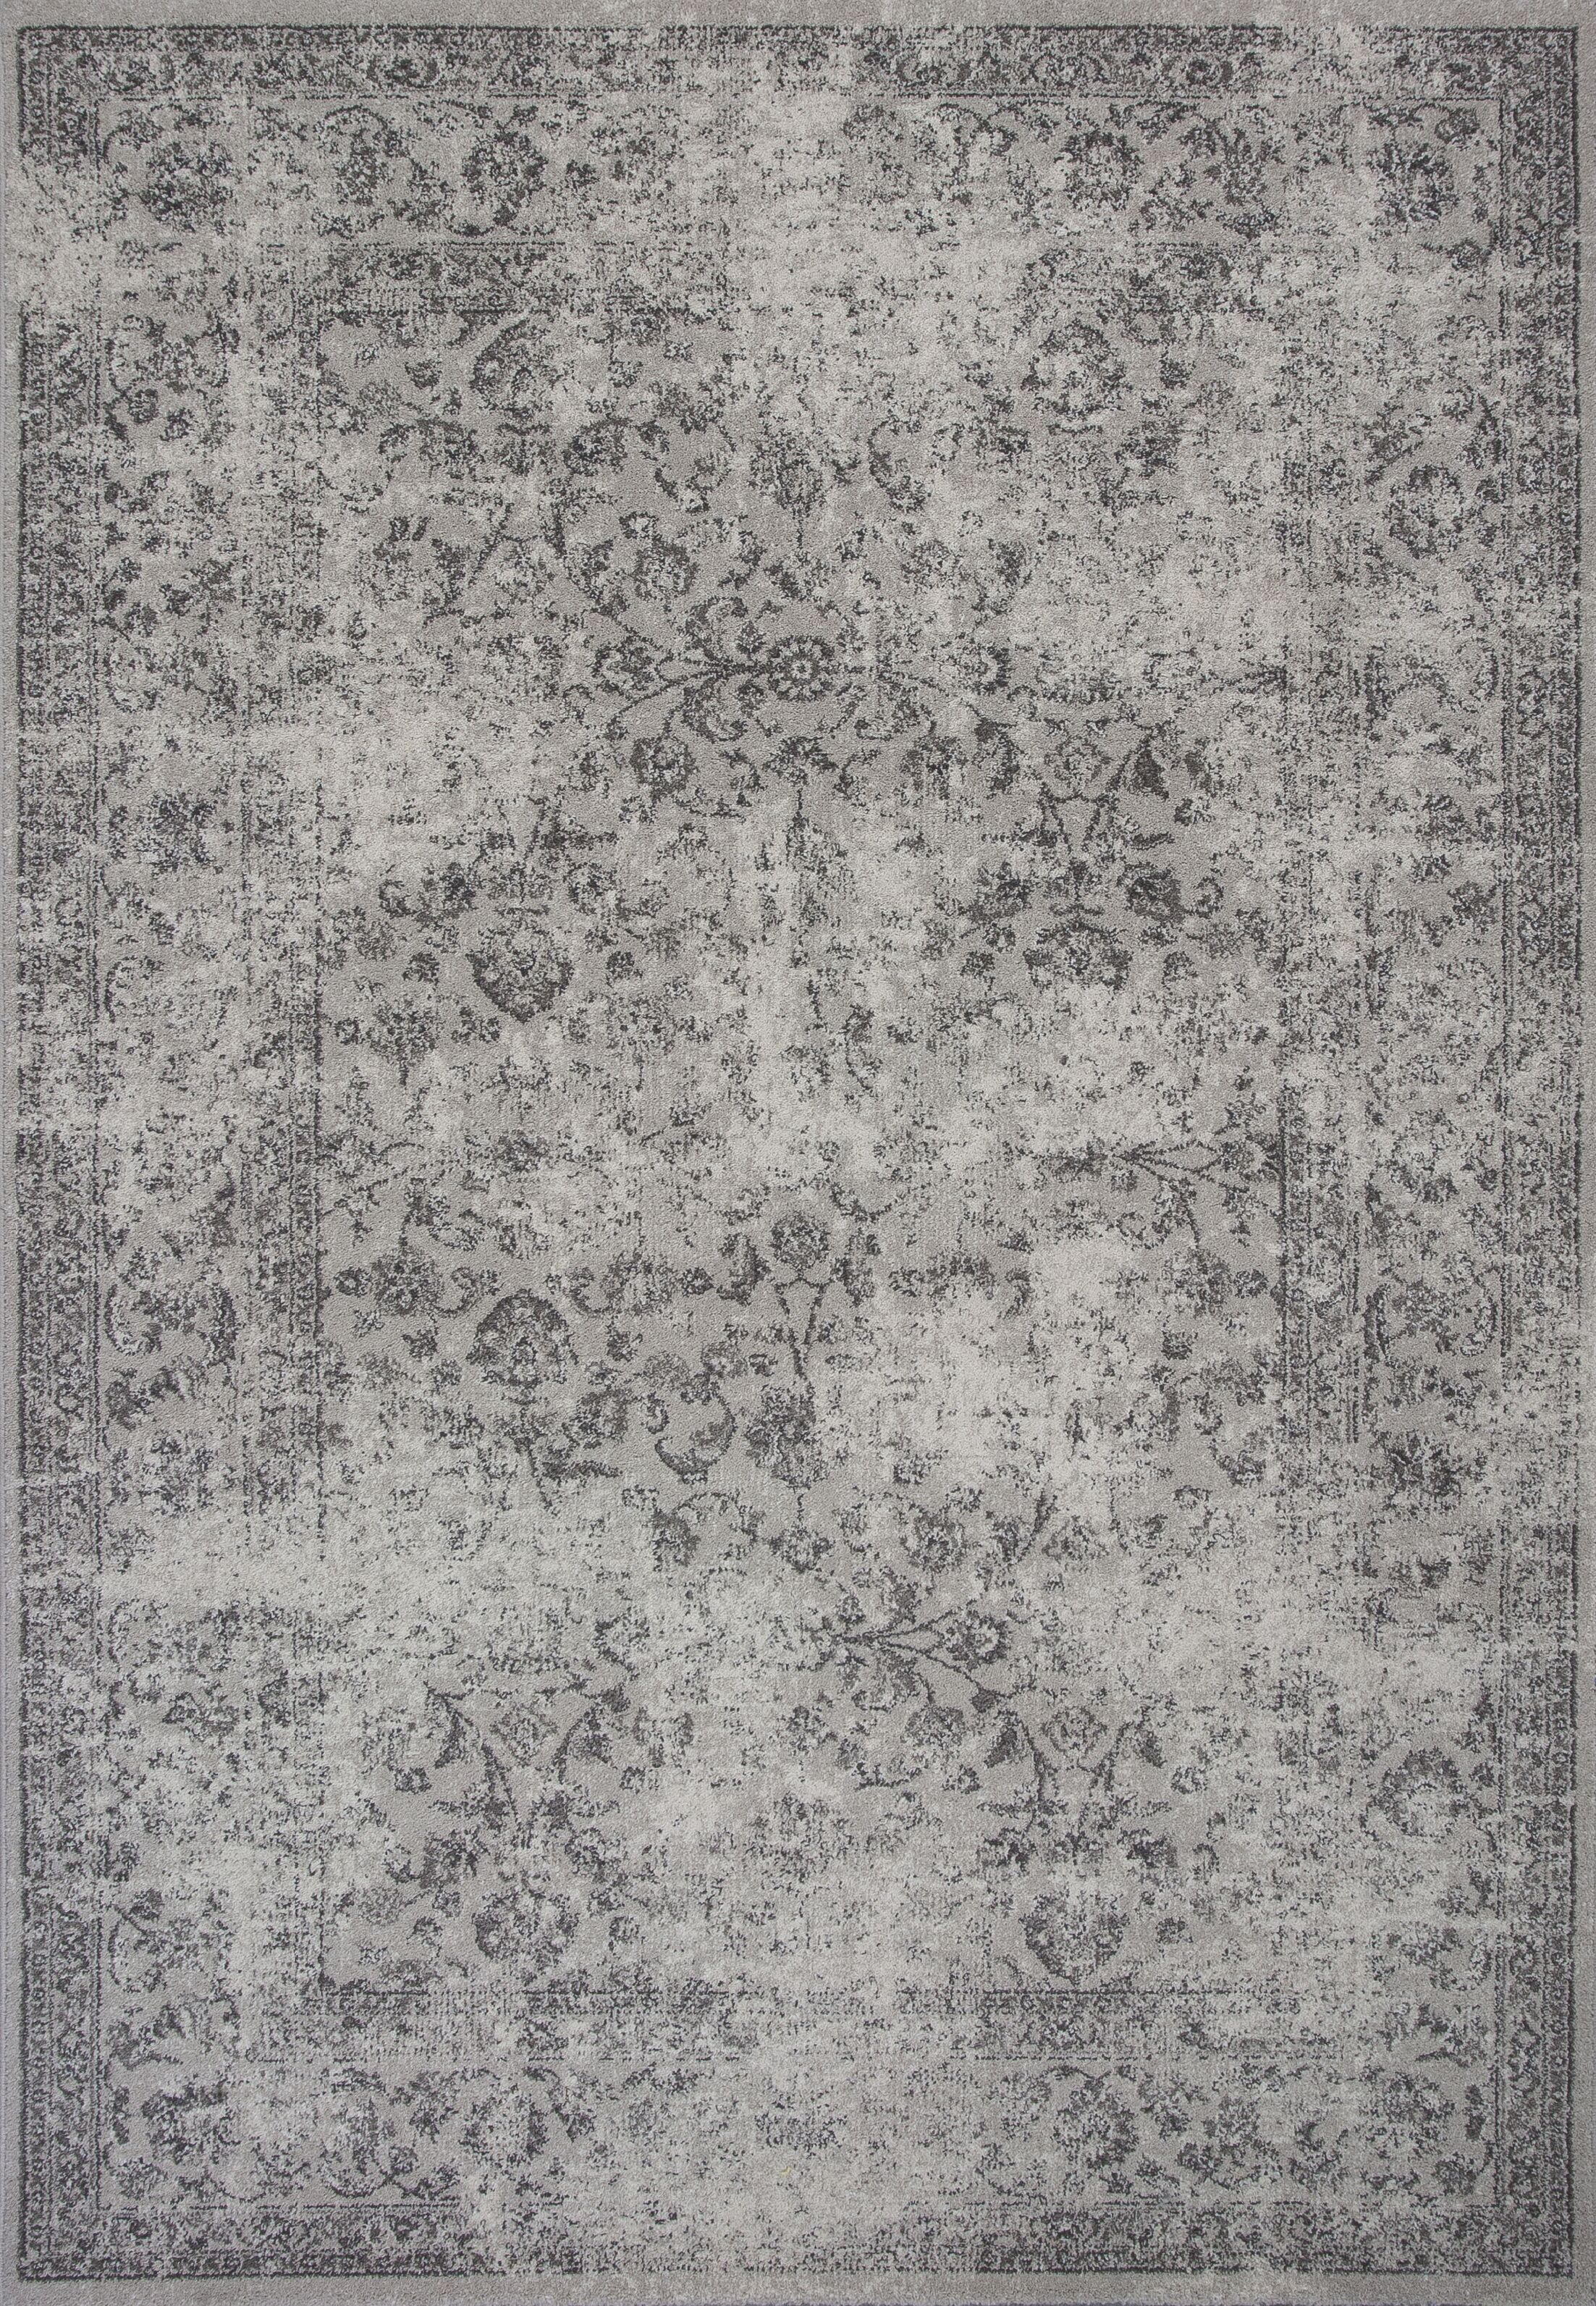 Cassandre Gray Area Rug Rug Size: 6'7